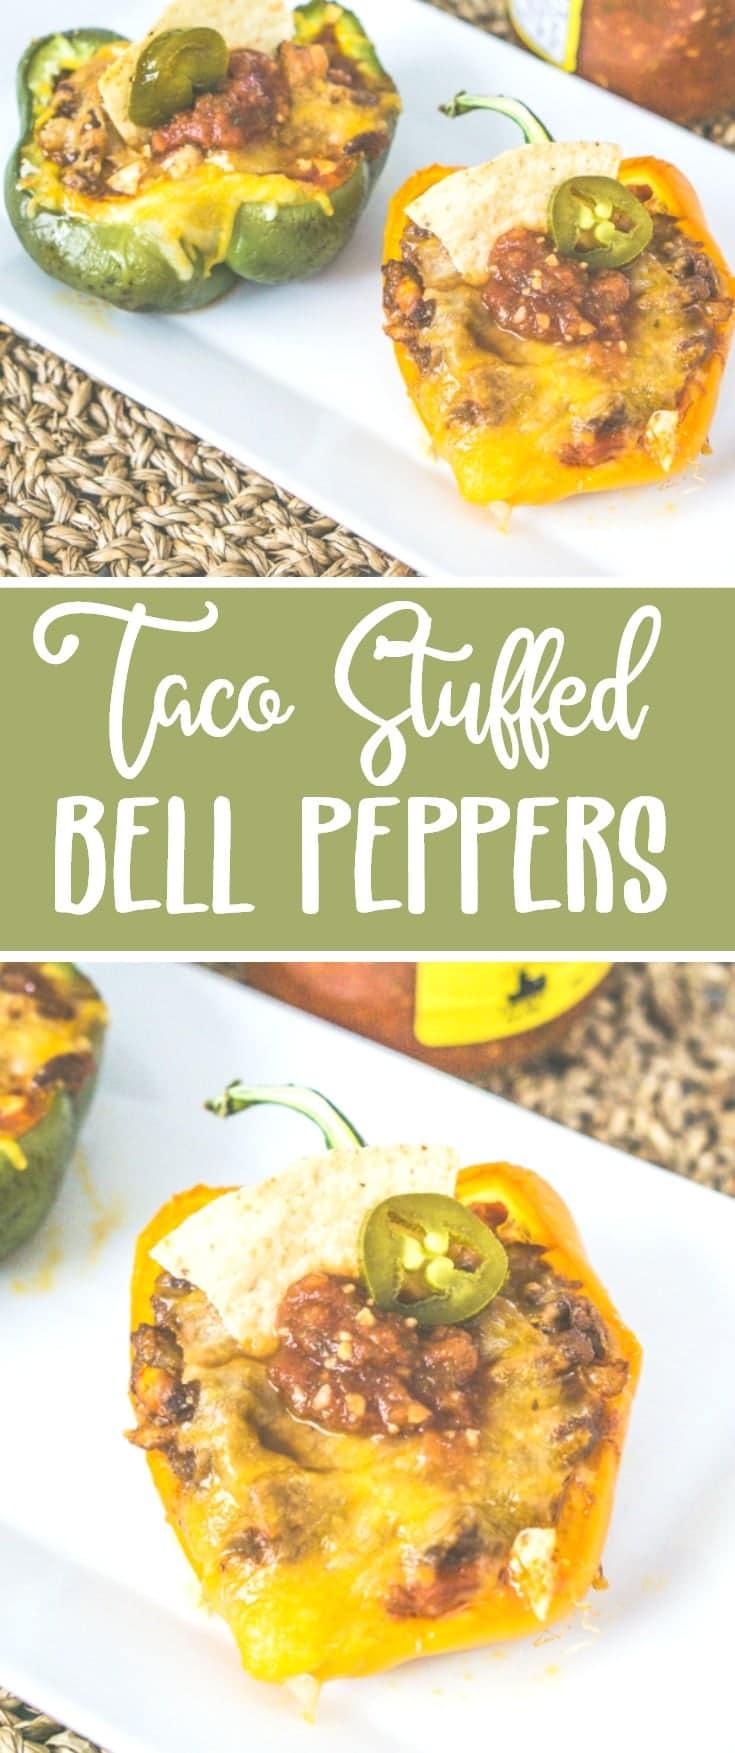 taco stuffed bell peppers recipe